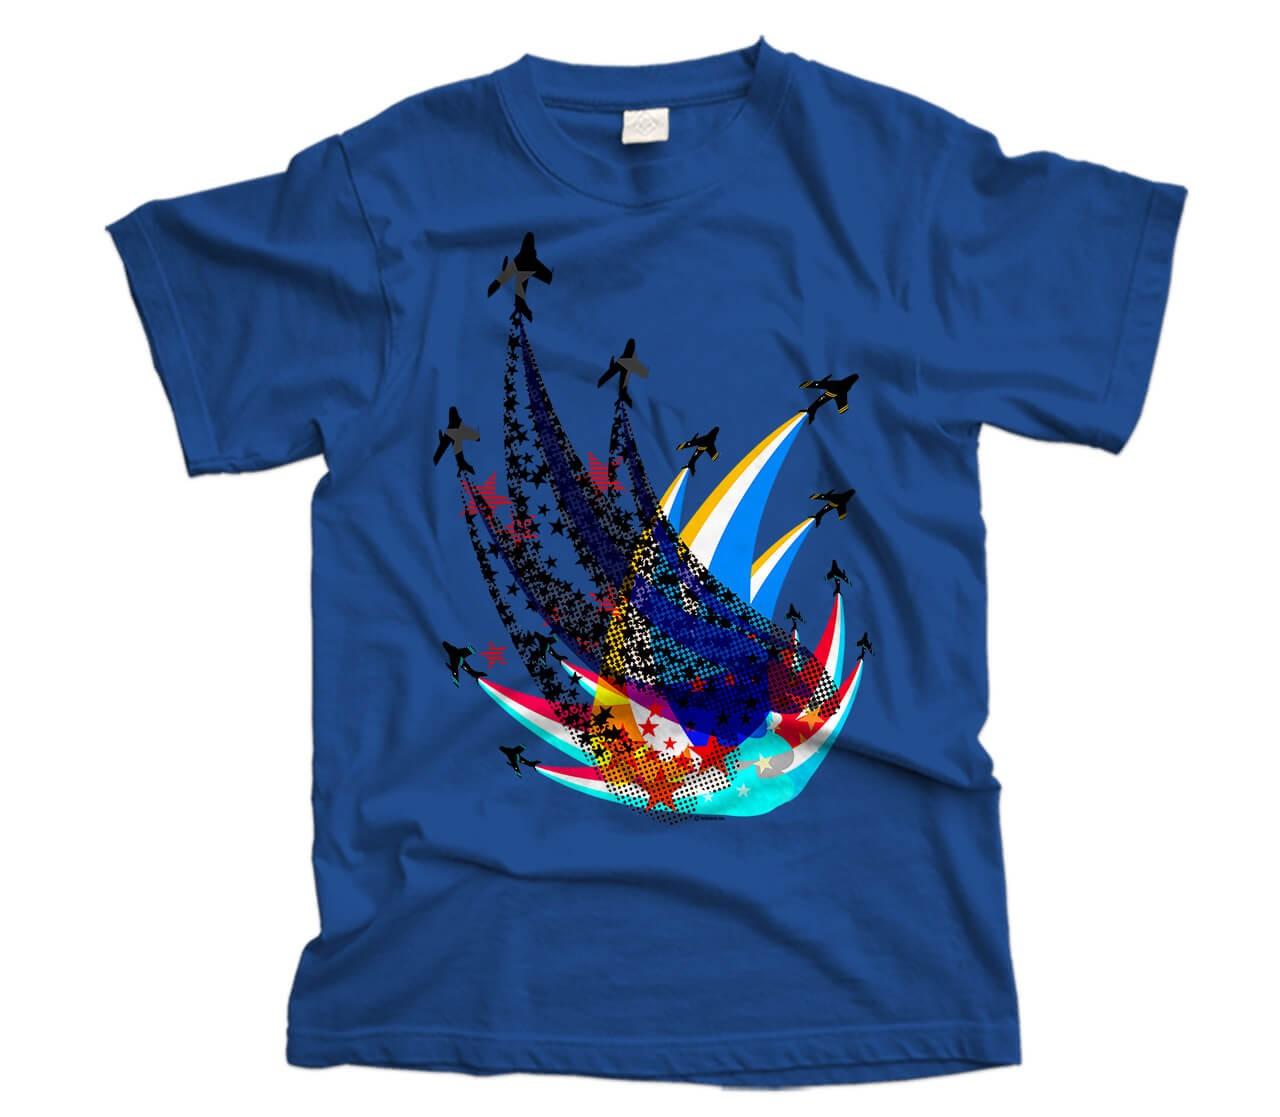 Sabre Flight Aircraft T-Shirt